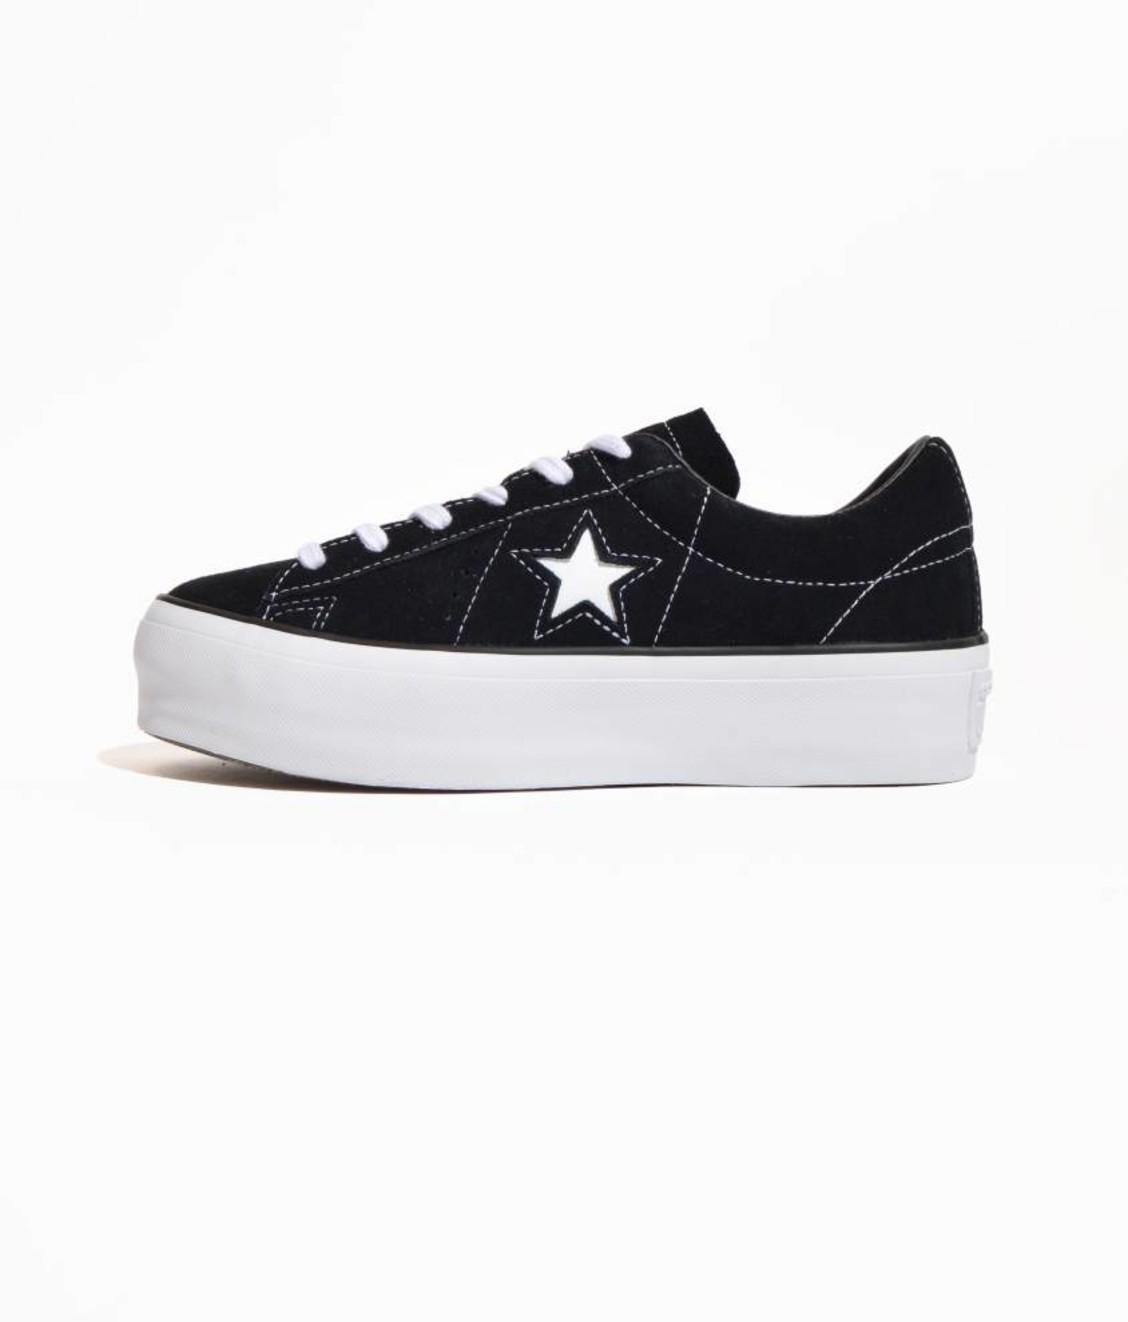 Converse Converse One Star Platform OX Black